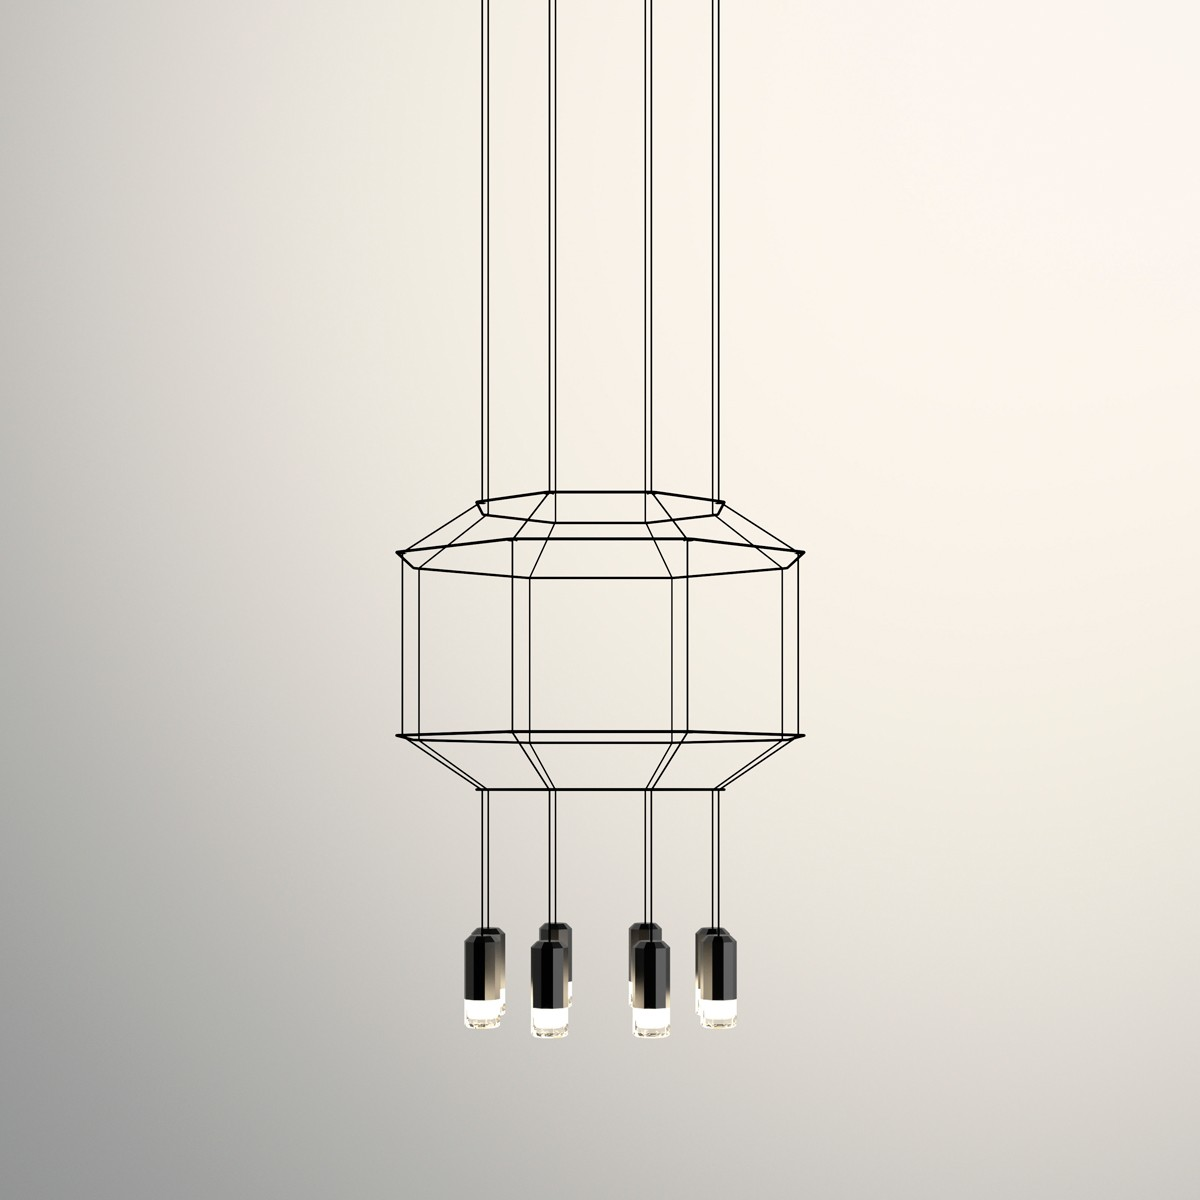 Vibia Wireflow Pendelleuchte, 8-flg., 120 x 120 cm, schwarz